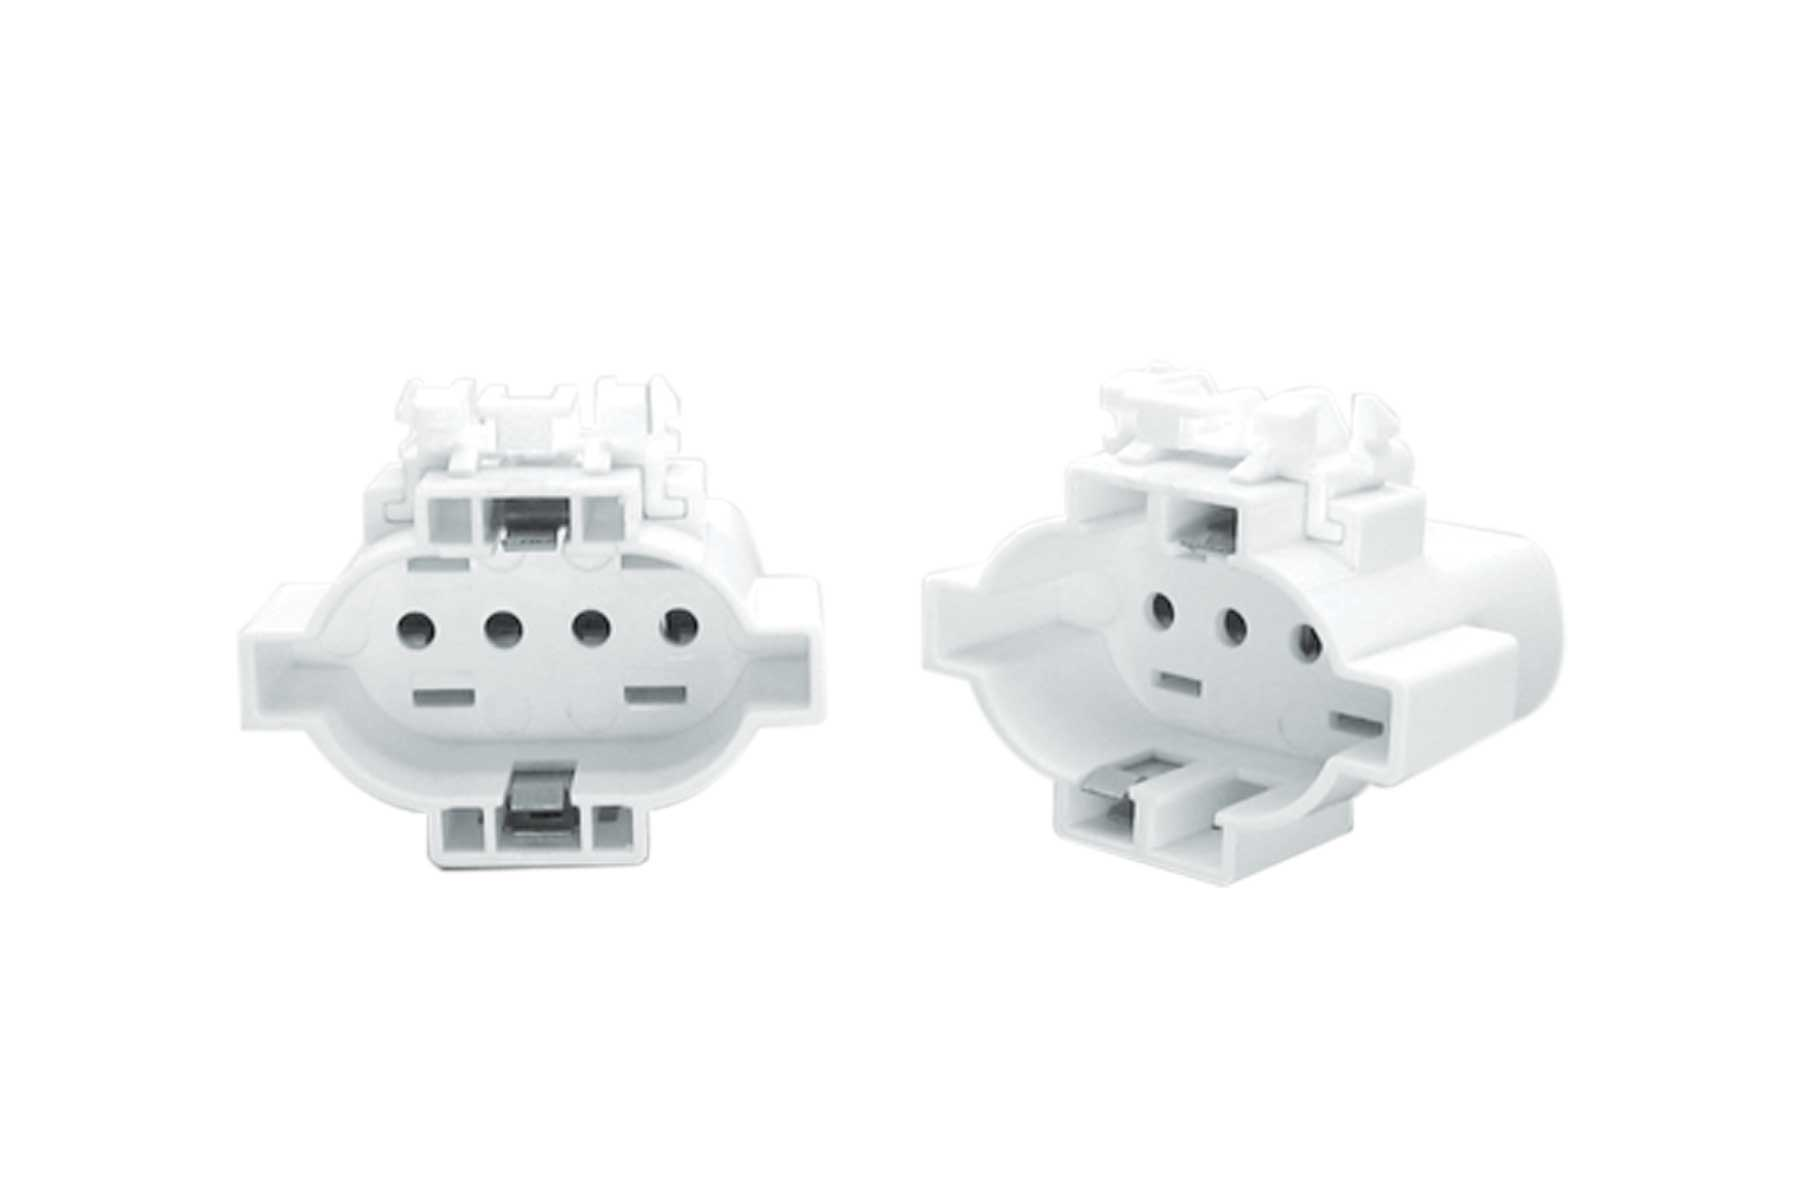 2GX7 CFL Light Socket - Horizontal Snap-in Mount